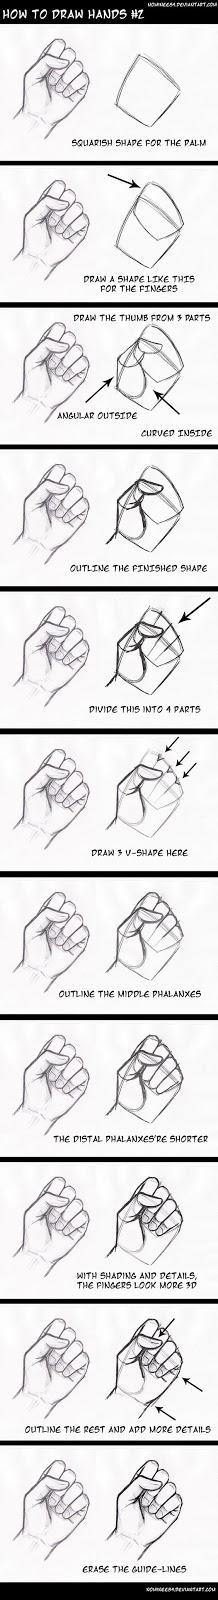 Cara Menggambar Tangan